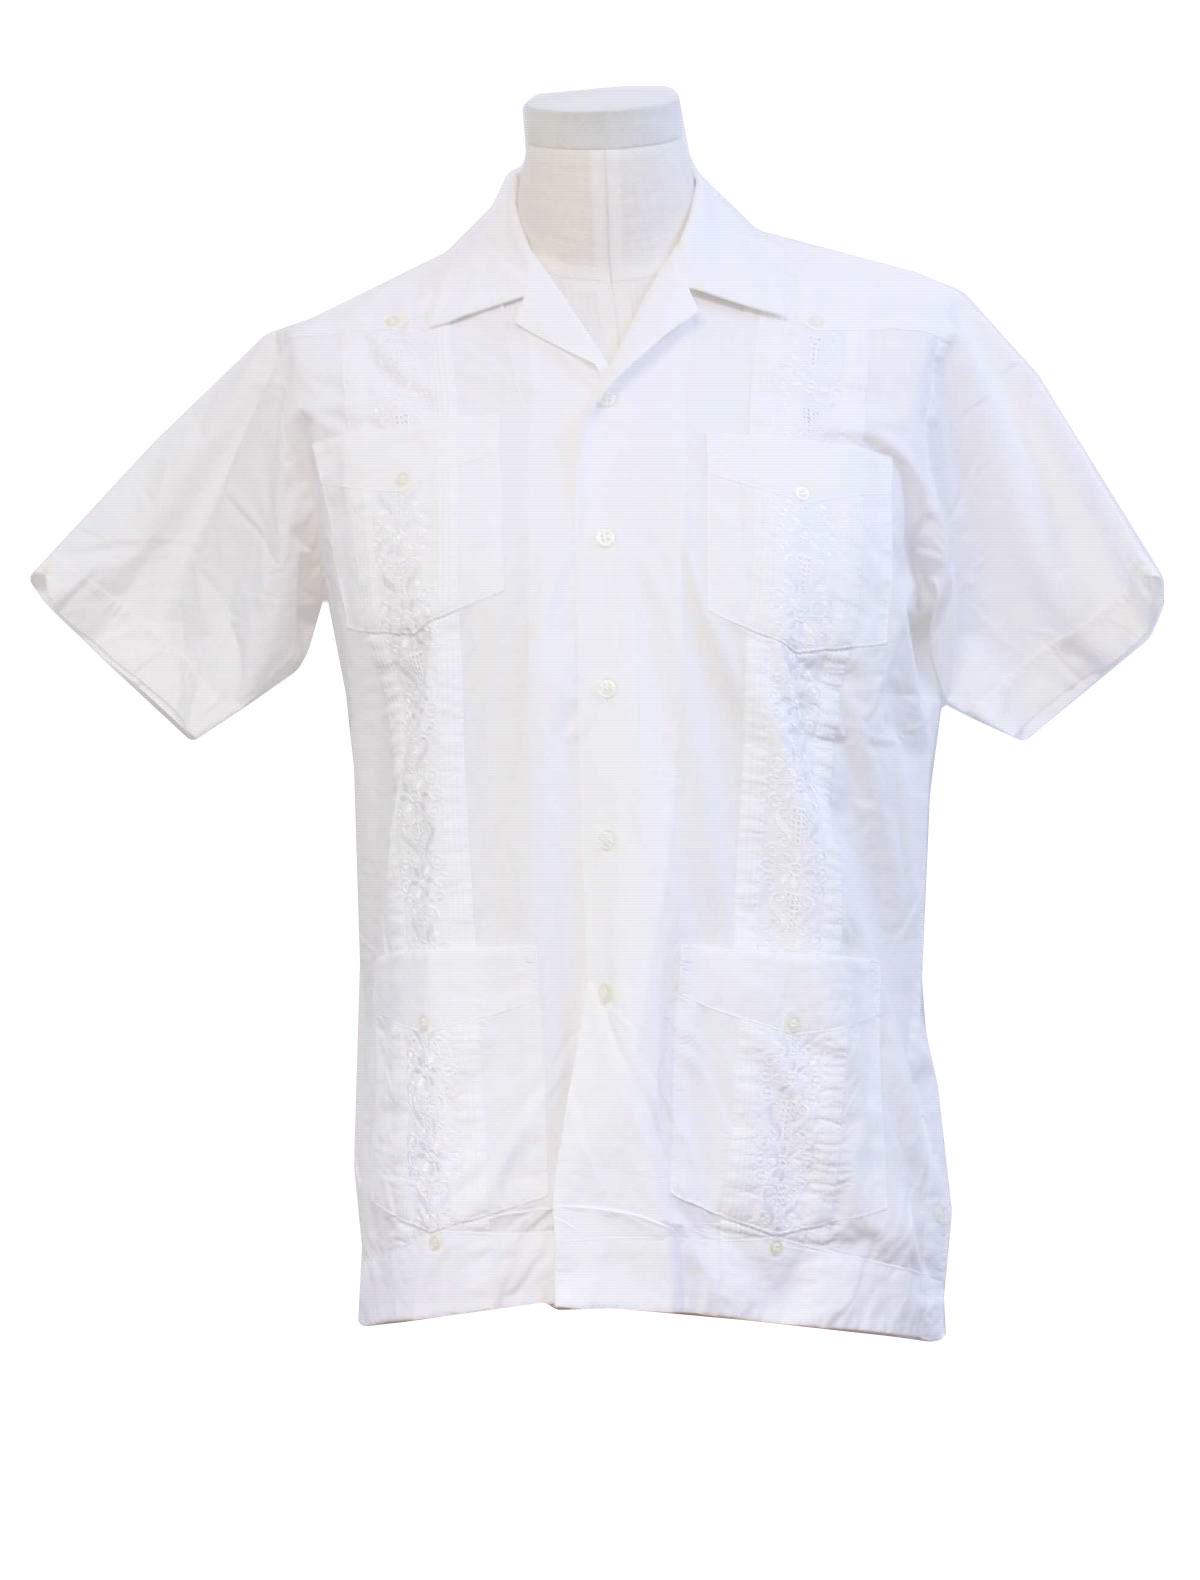 Mexican Wedding Shirt | 80 S Vintage Guayabera Shirt Romani Mens White Cotton And